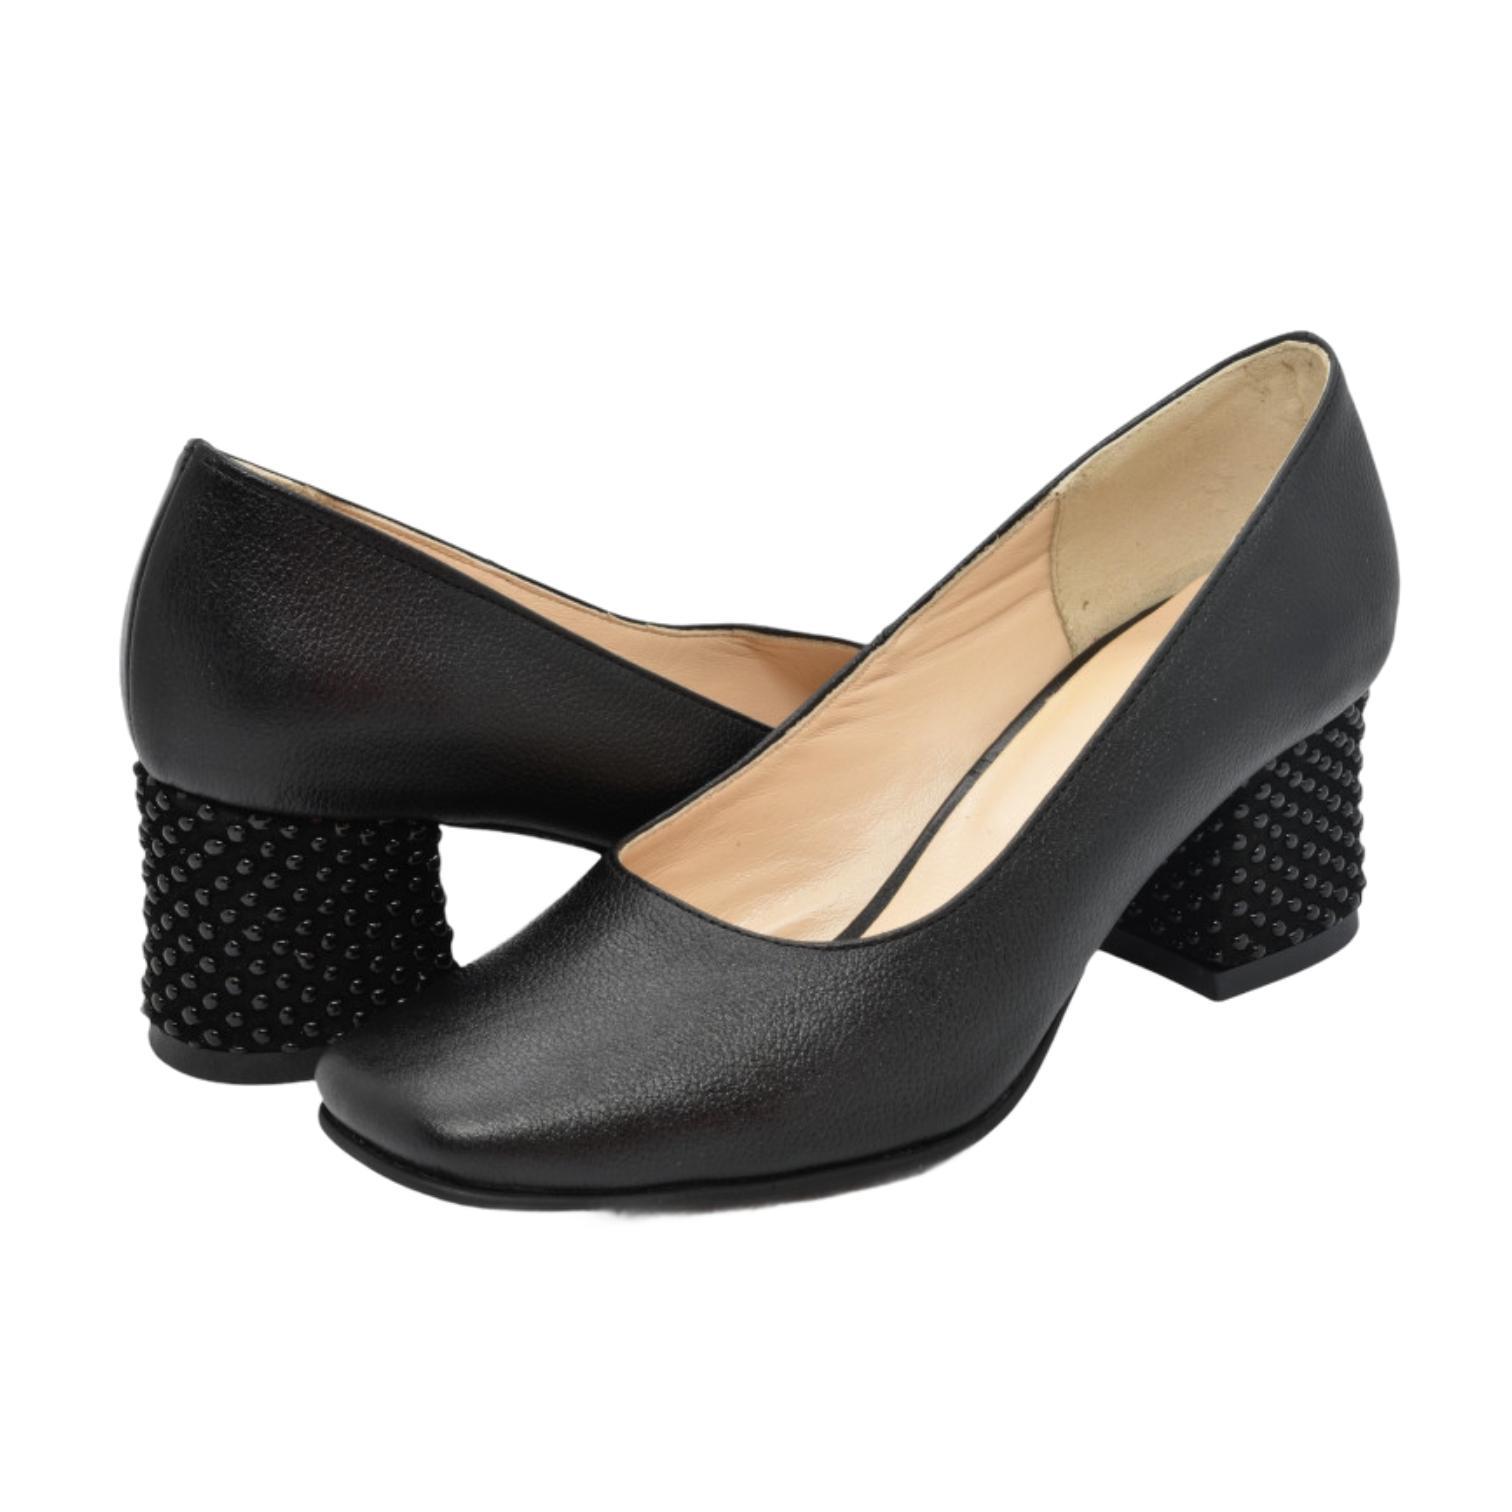 Pantofi negri cu toc cu aplicatii sferice